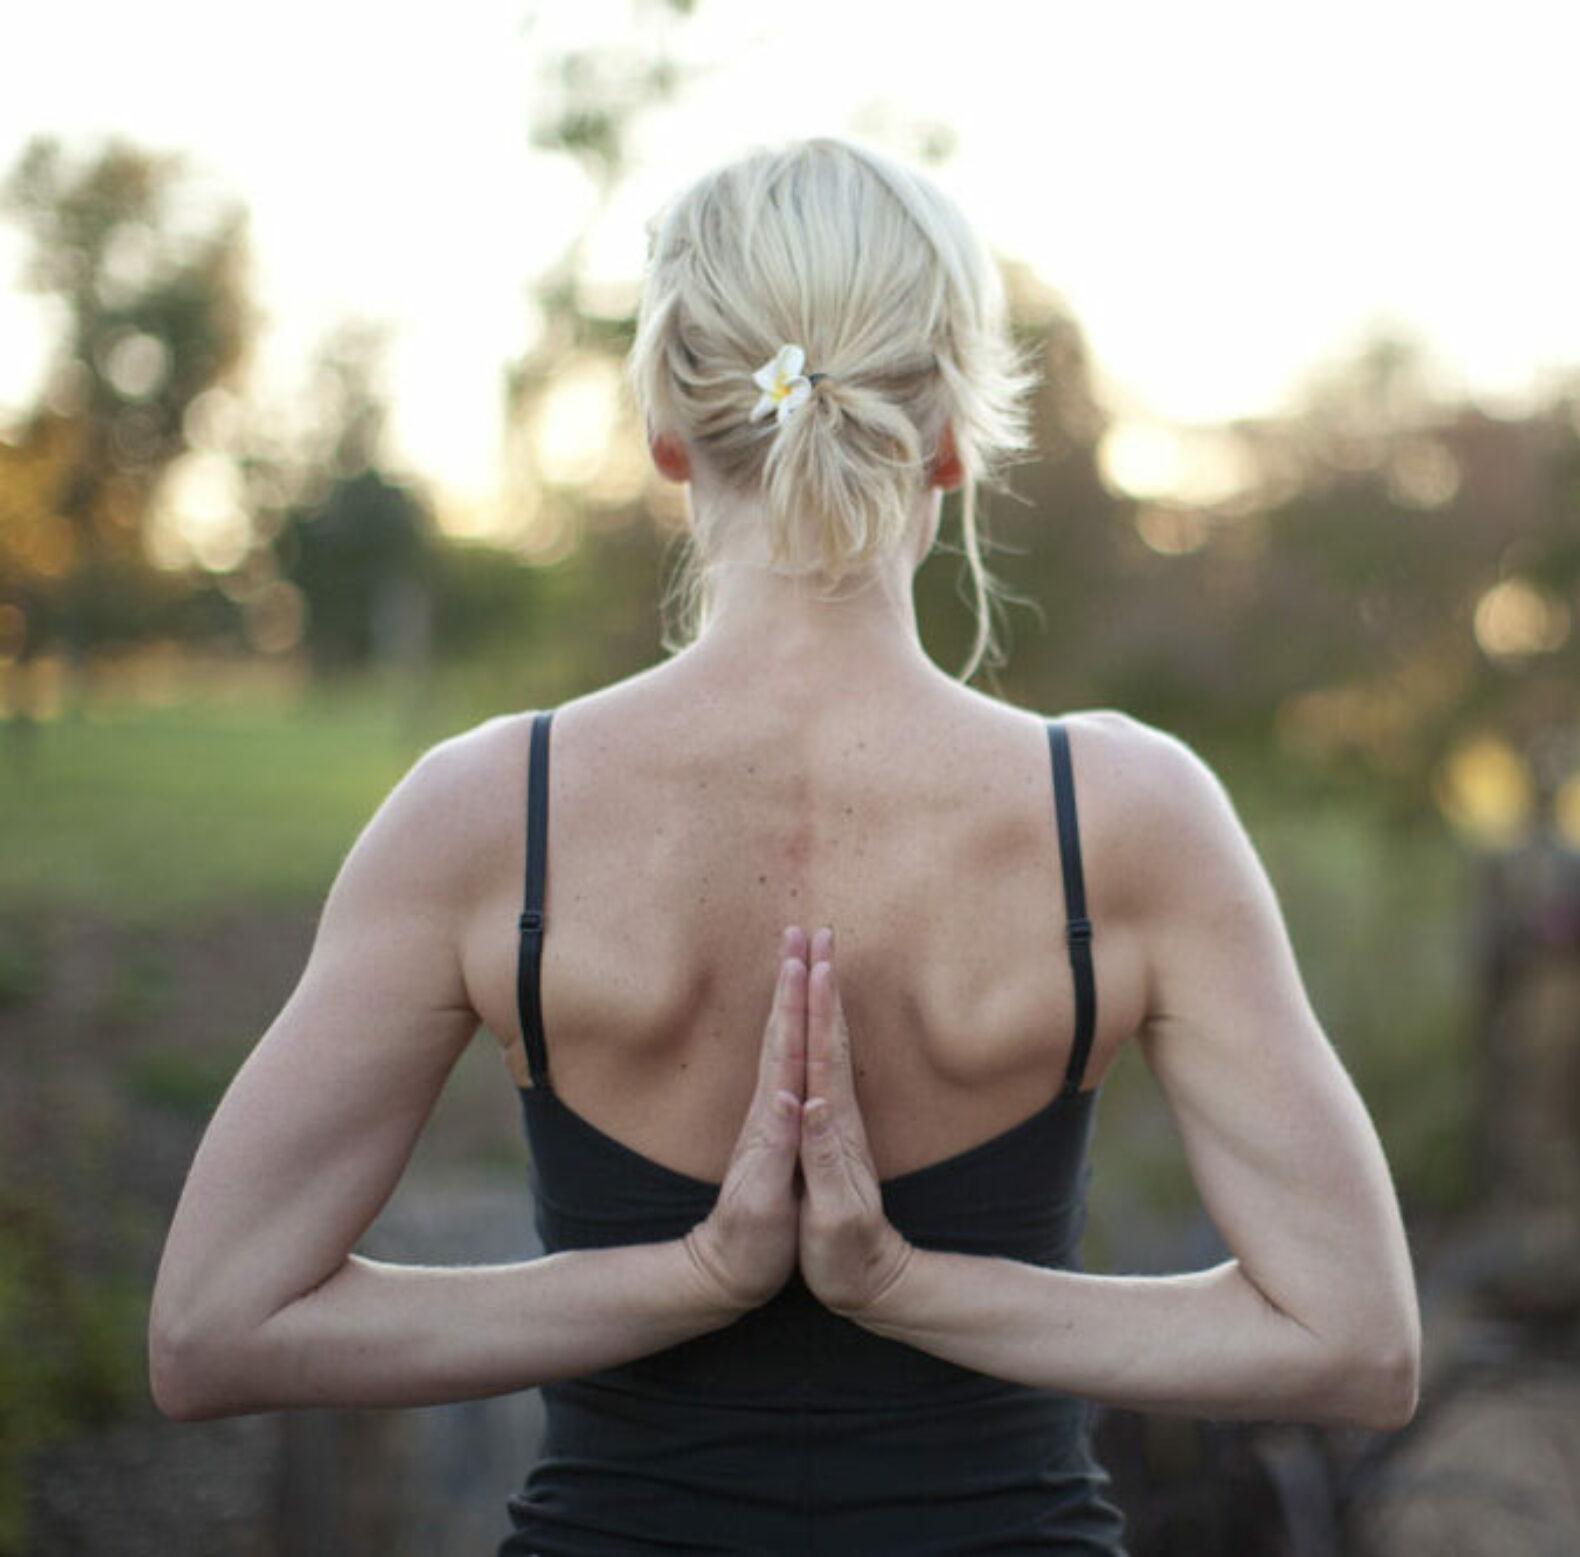 woman-yoga-arm-stretching-outside-samadhi-health-wellness-retreat-australia